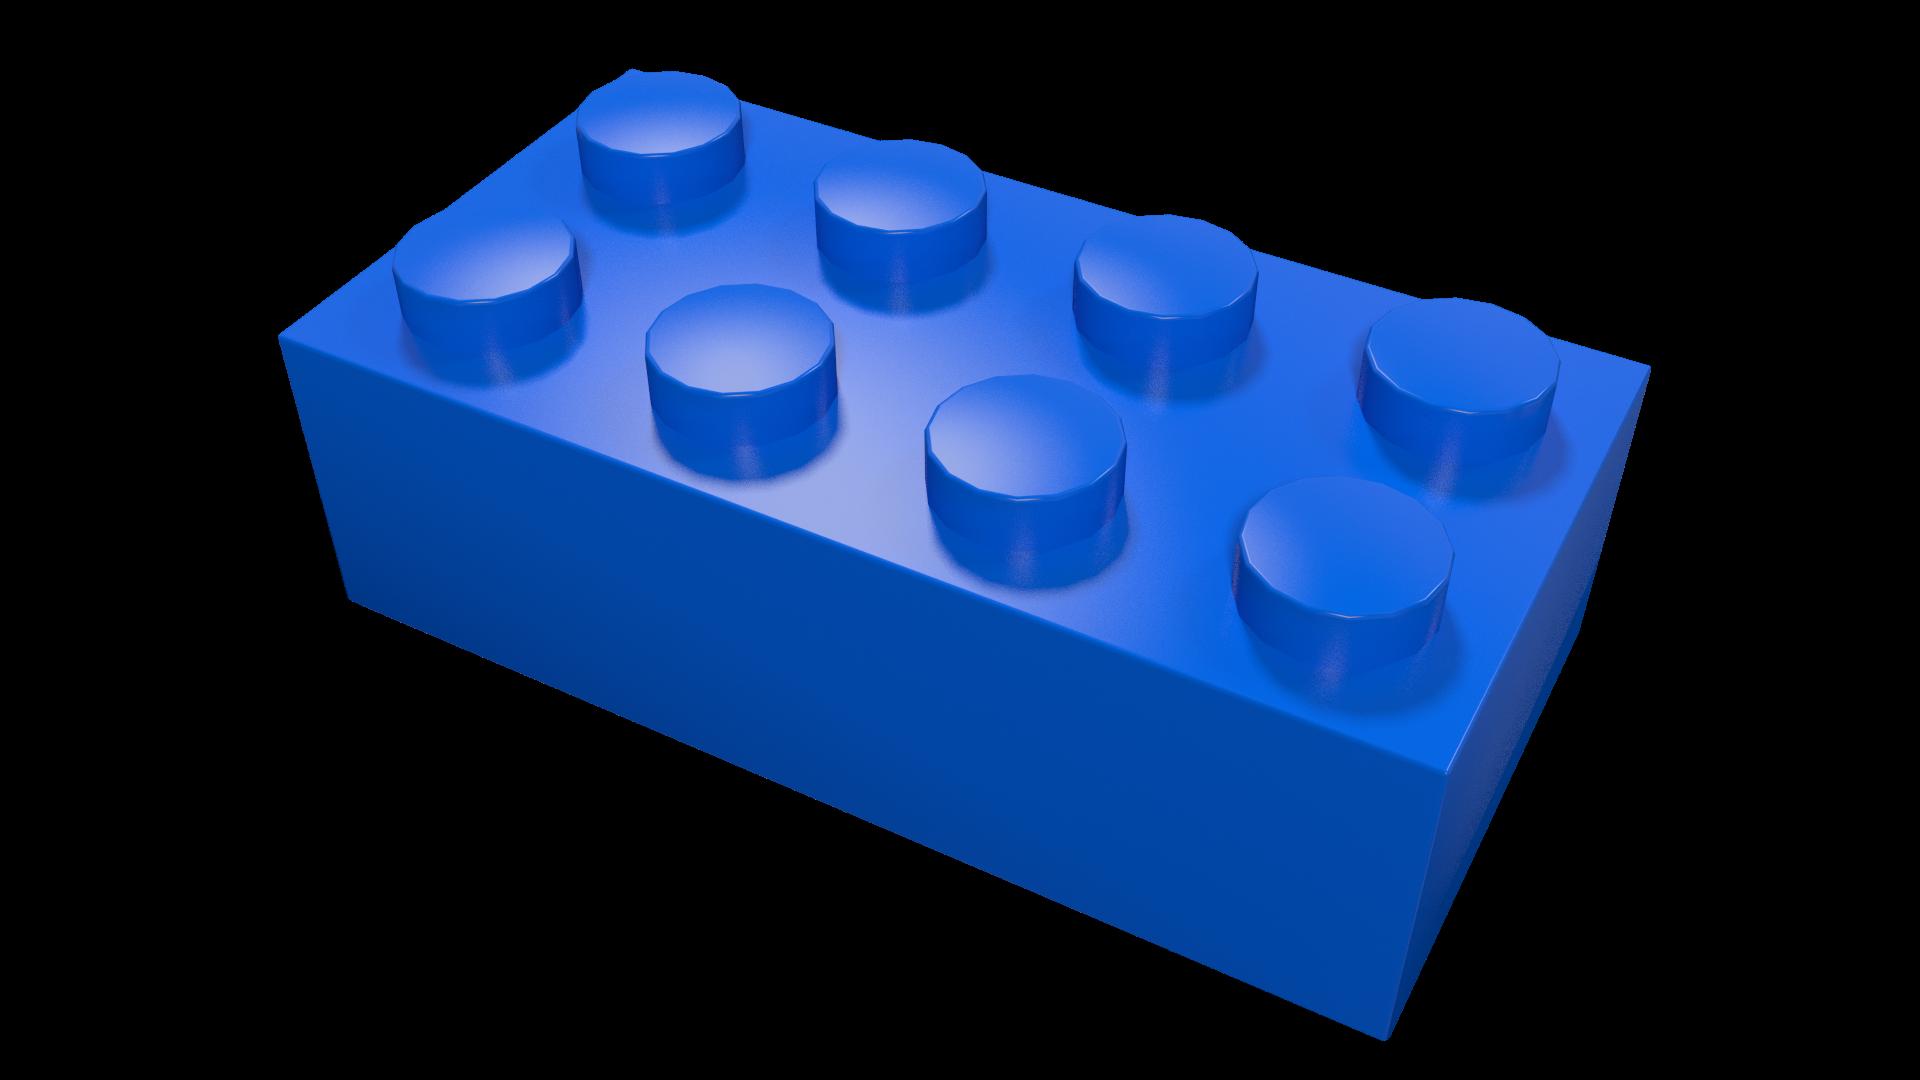 Blue lego clipart.